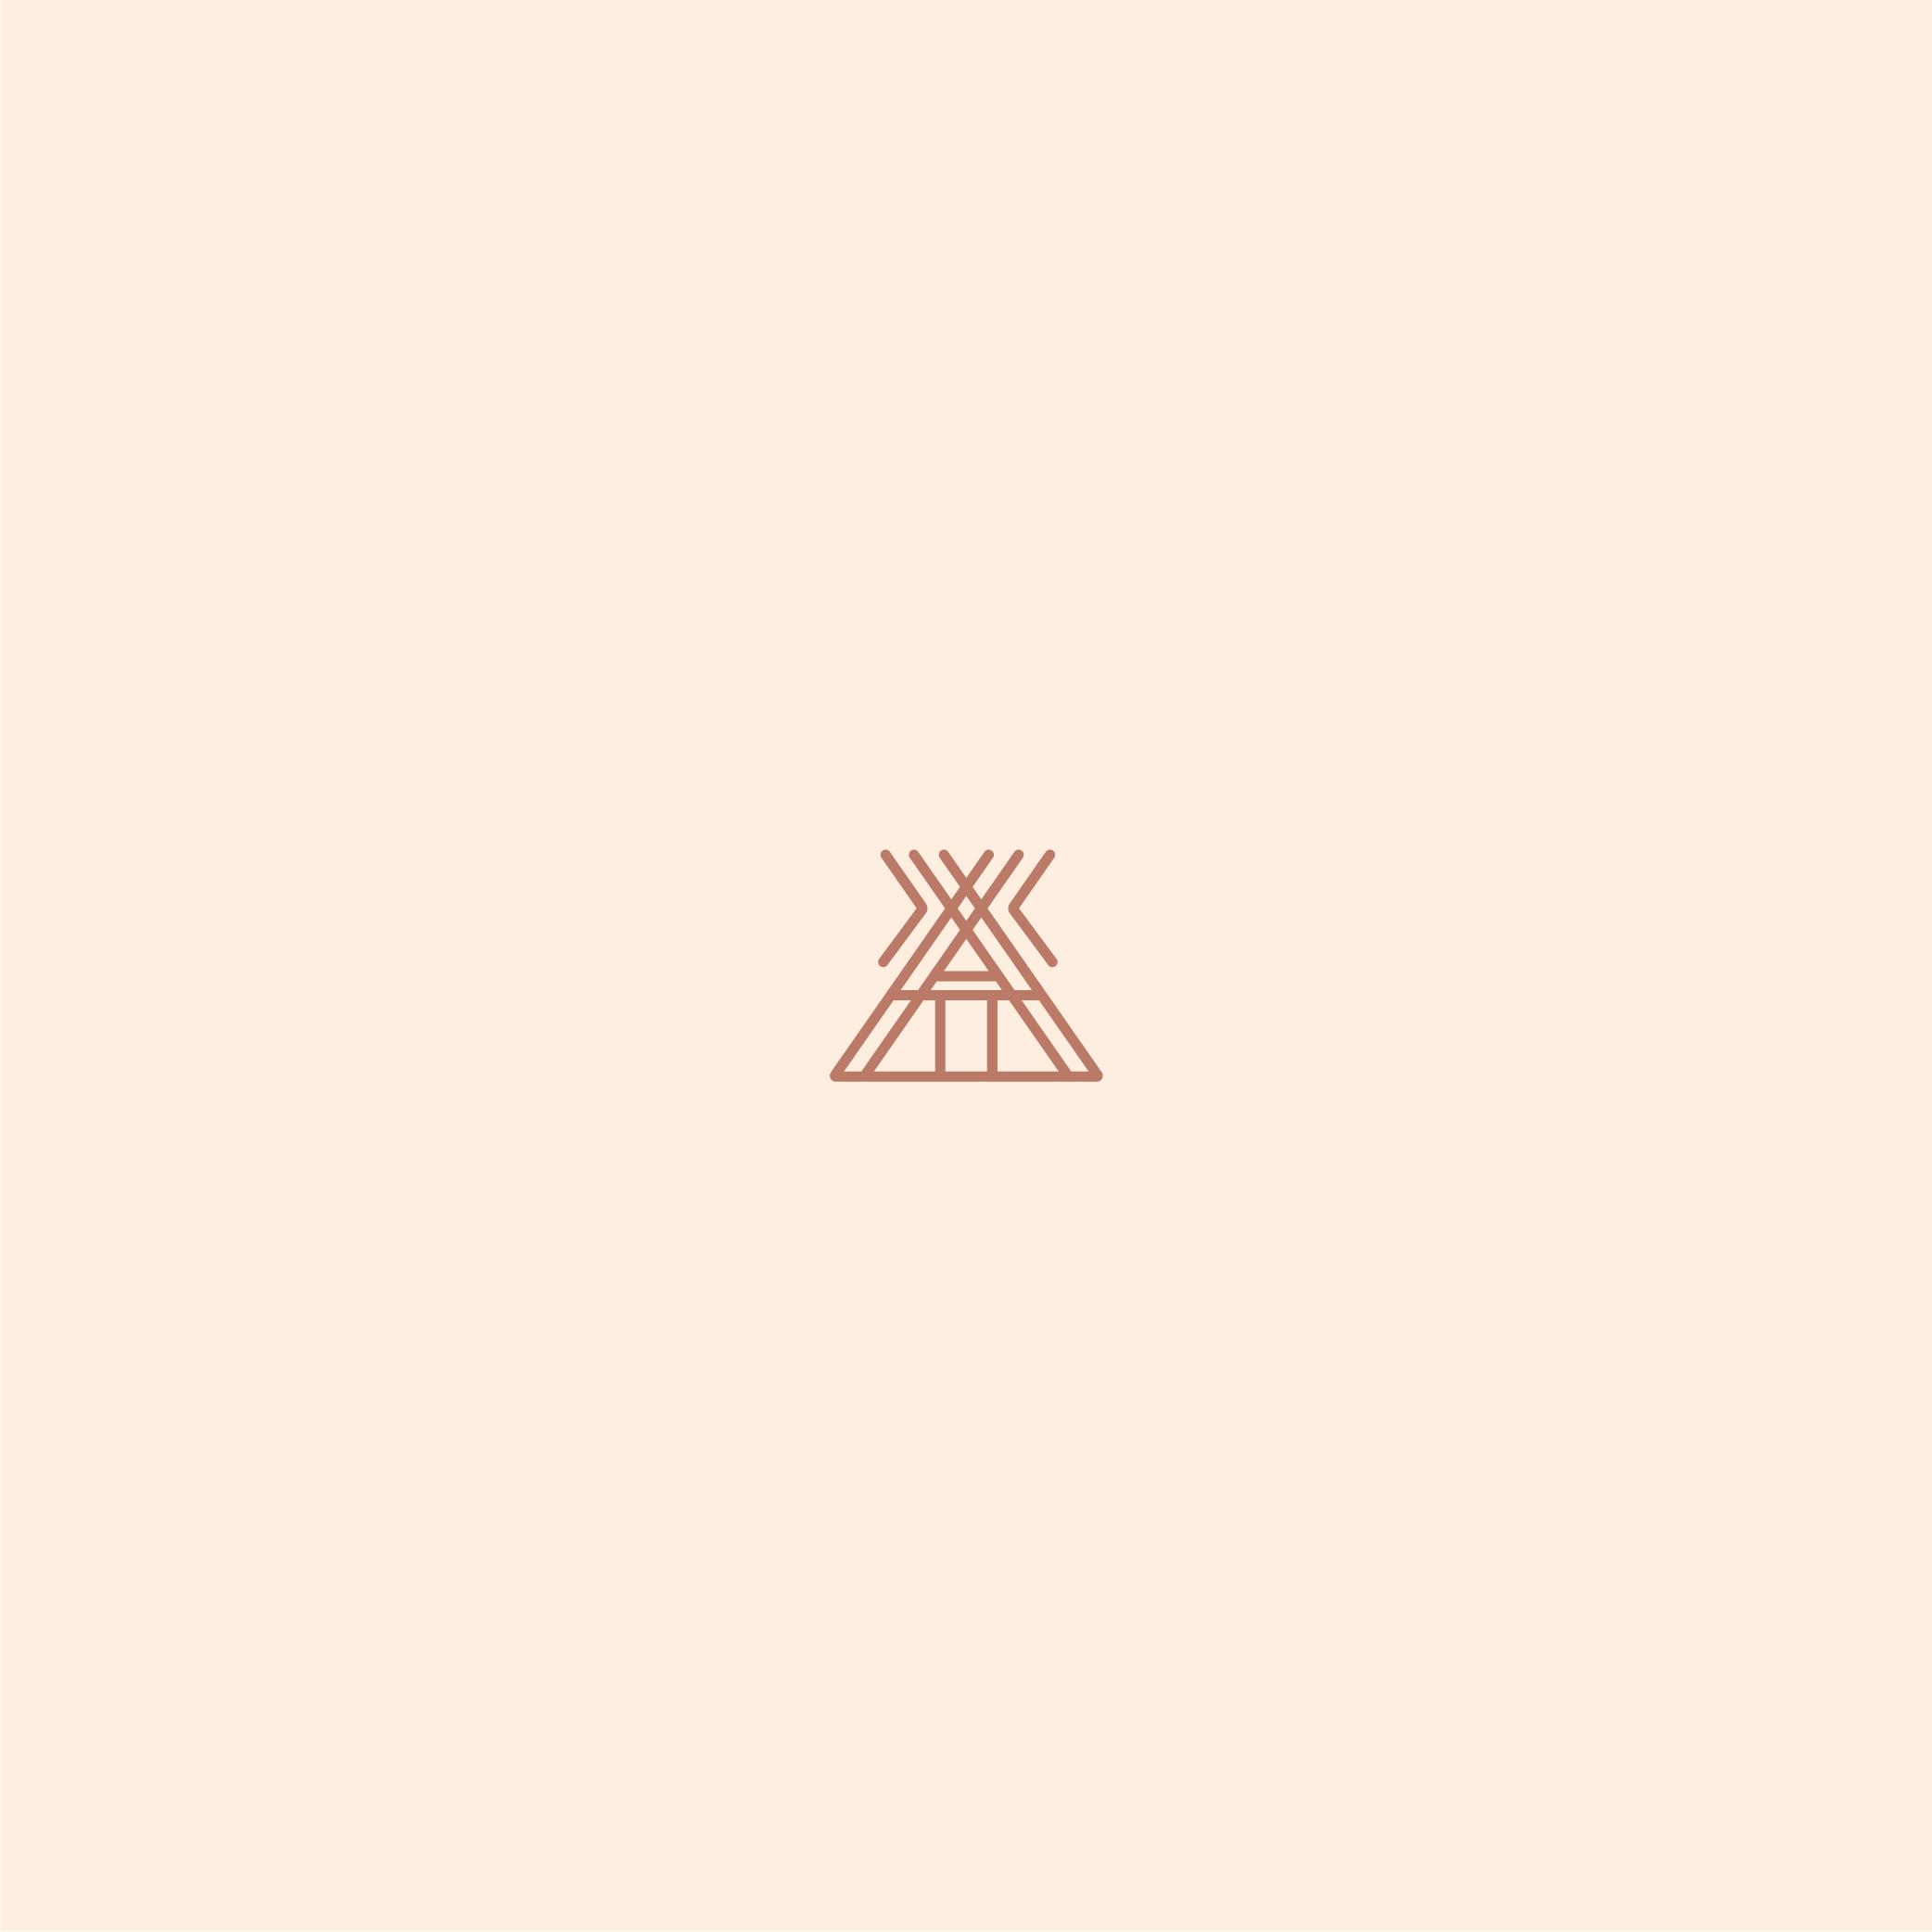 Inzho Final Logo-02.jpg